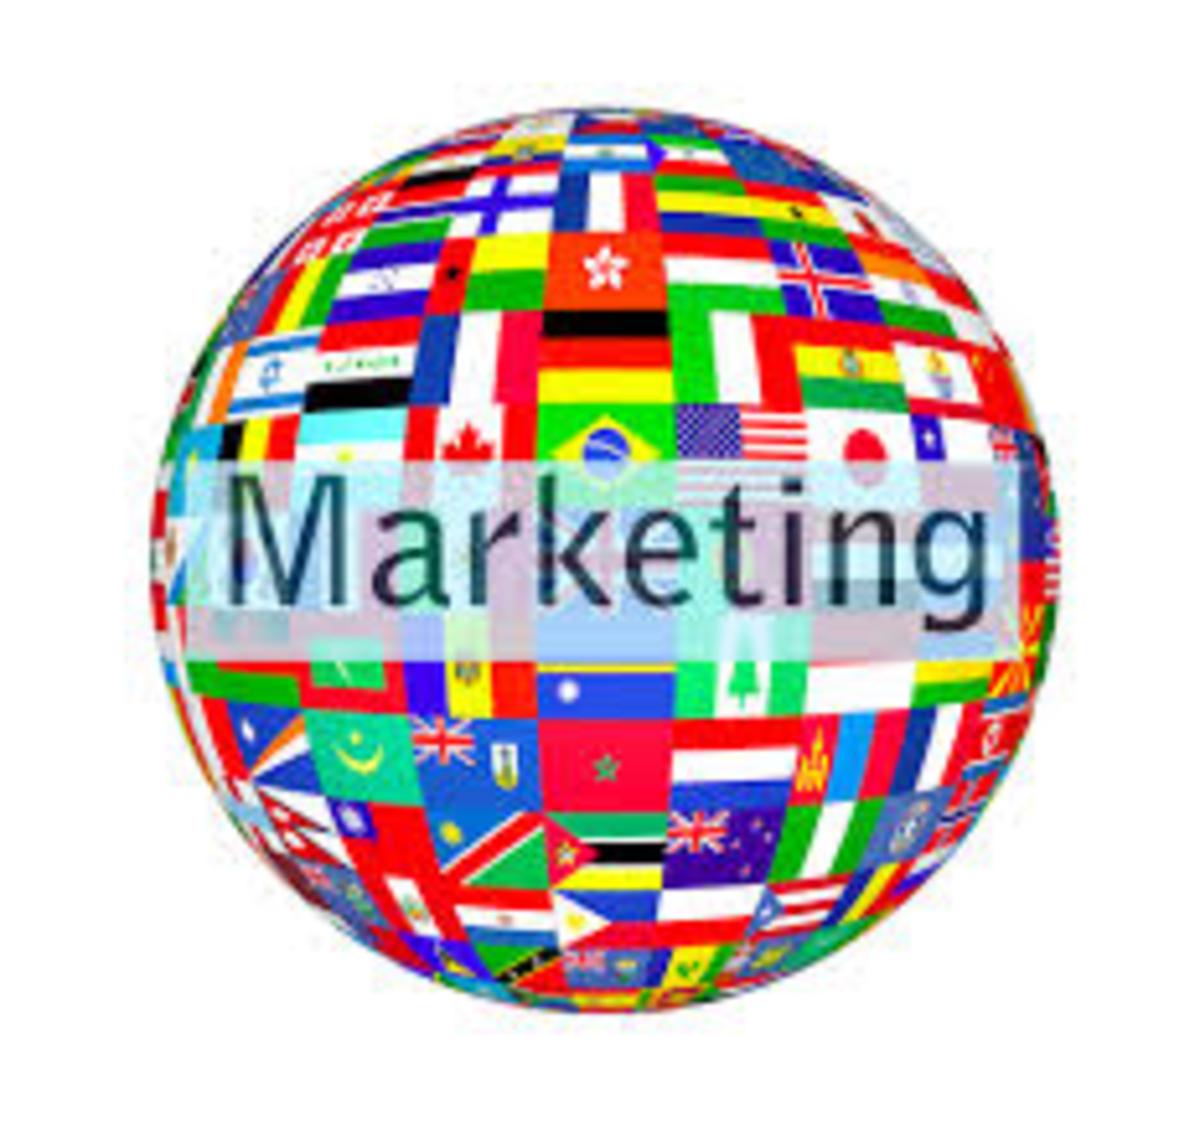 global-marketing-five-basic-segmentation-strategies-and-four-general-positioning-strategies